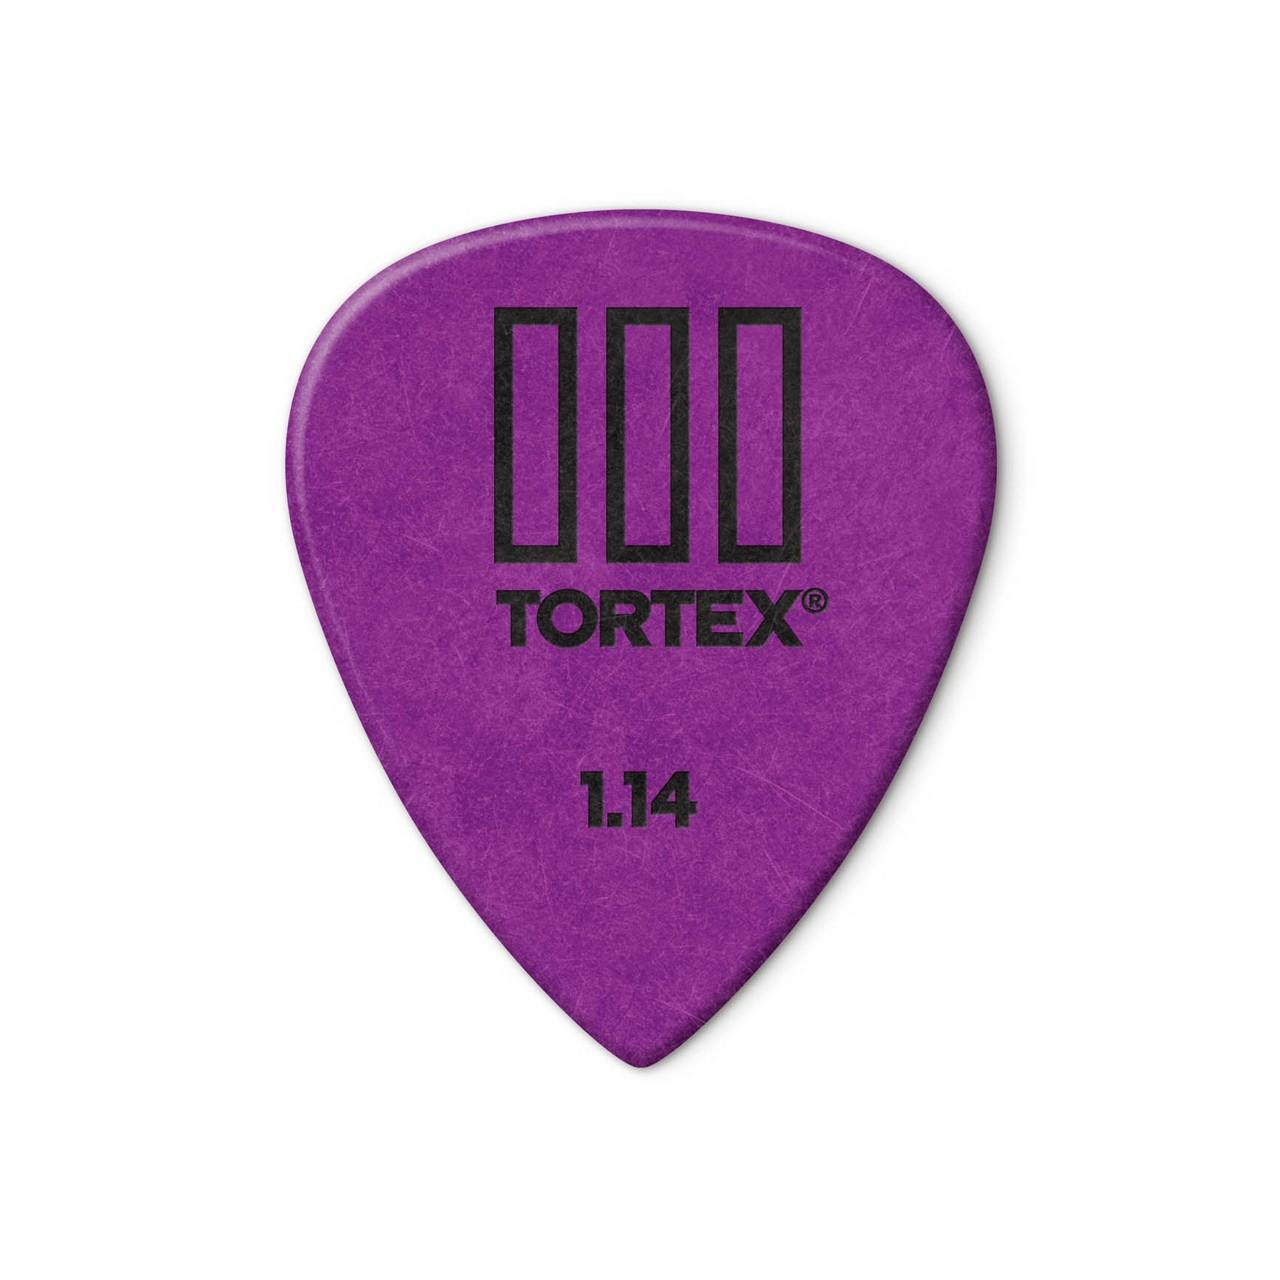 Palheta Tortex Iii 462r 1,14mm Pct C/72 462r1.14 Dunlop